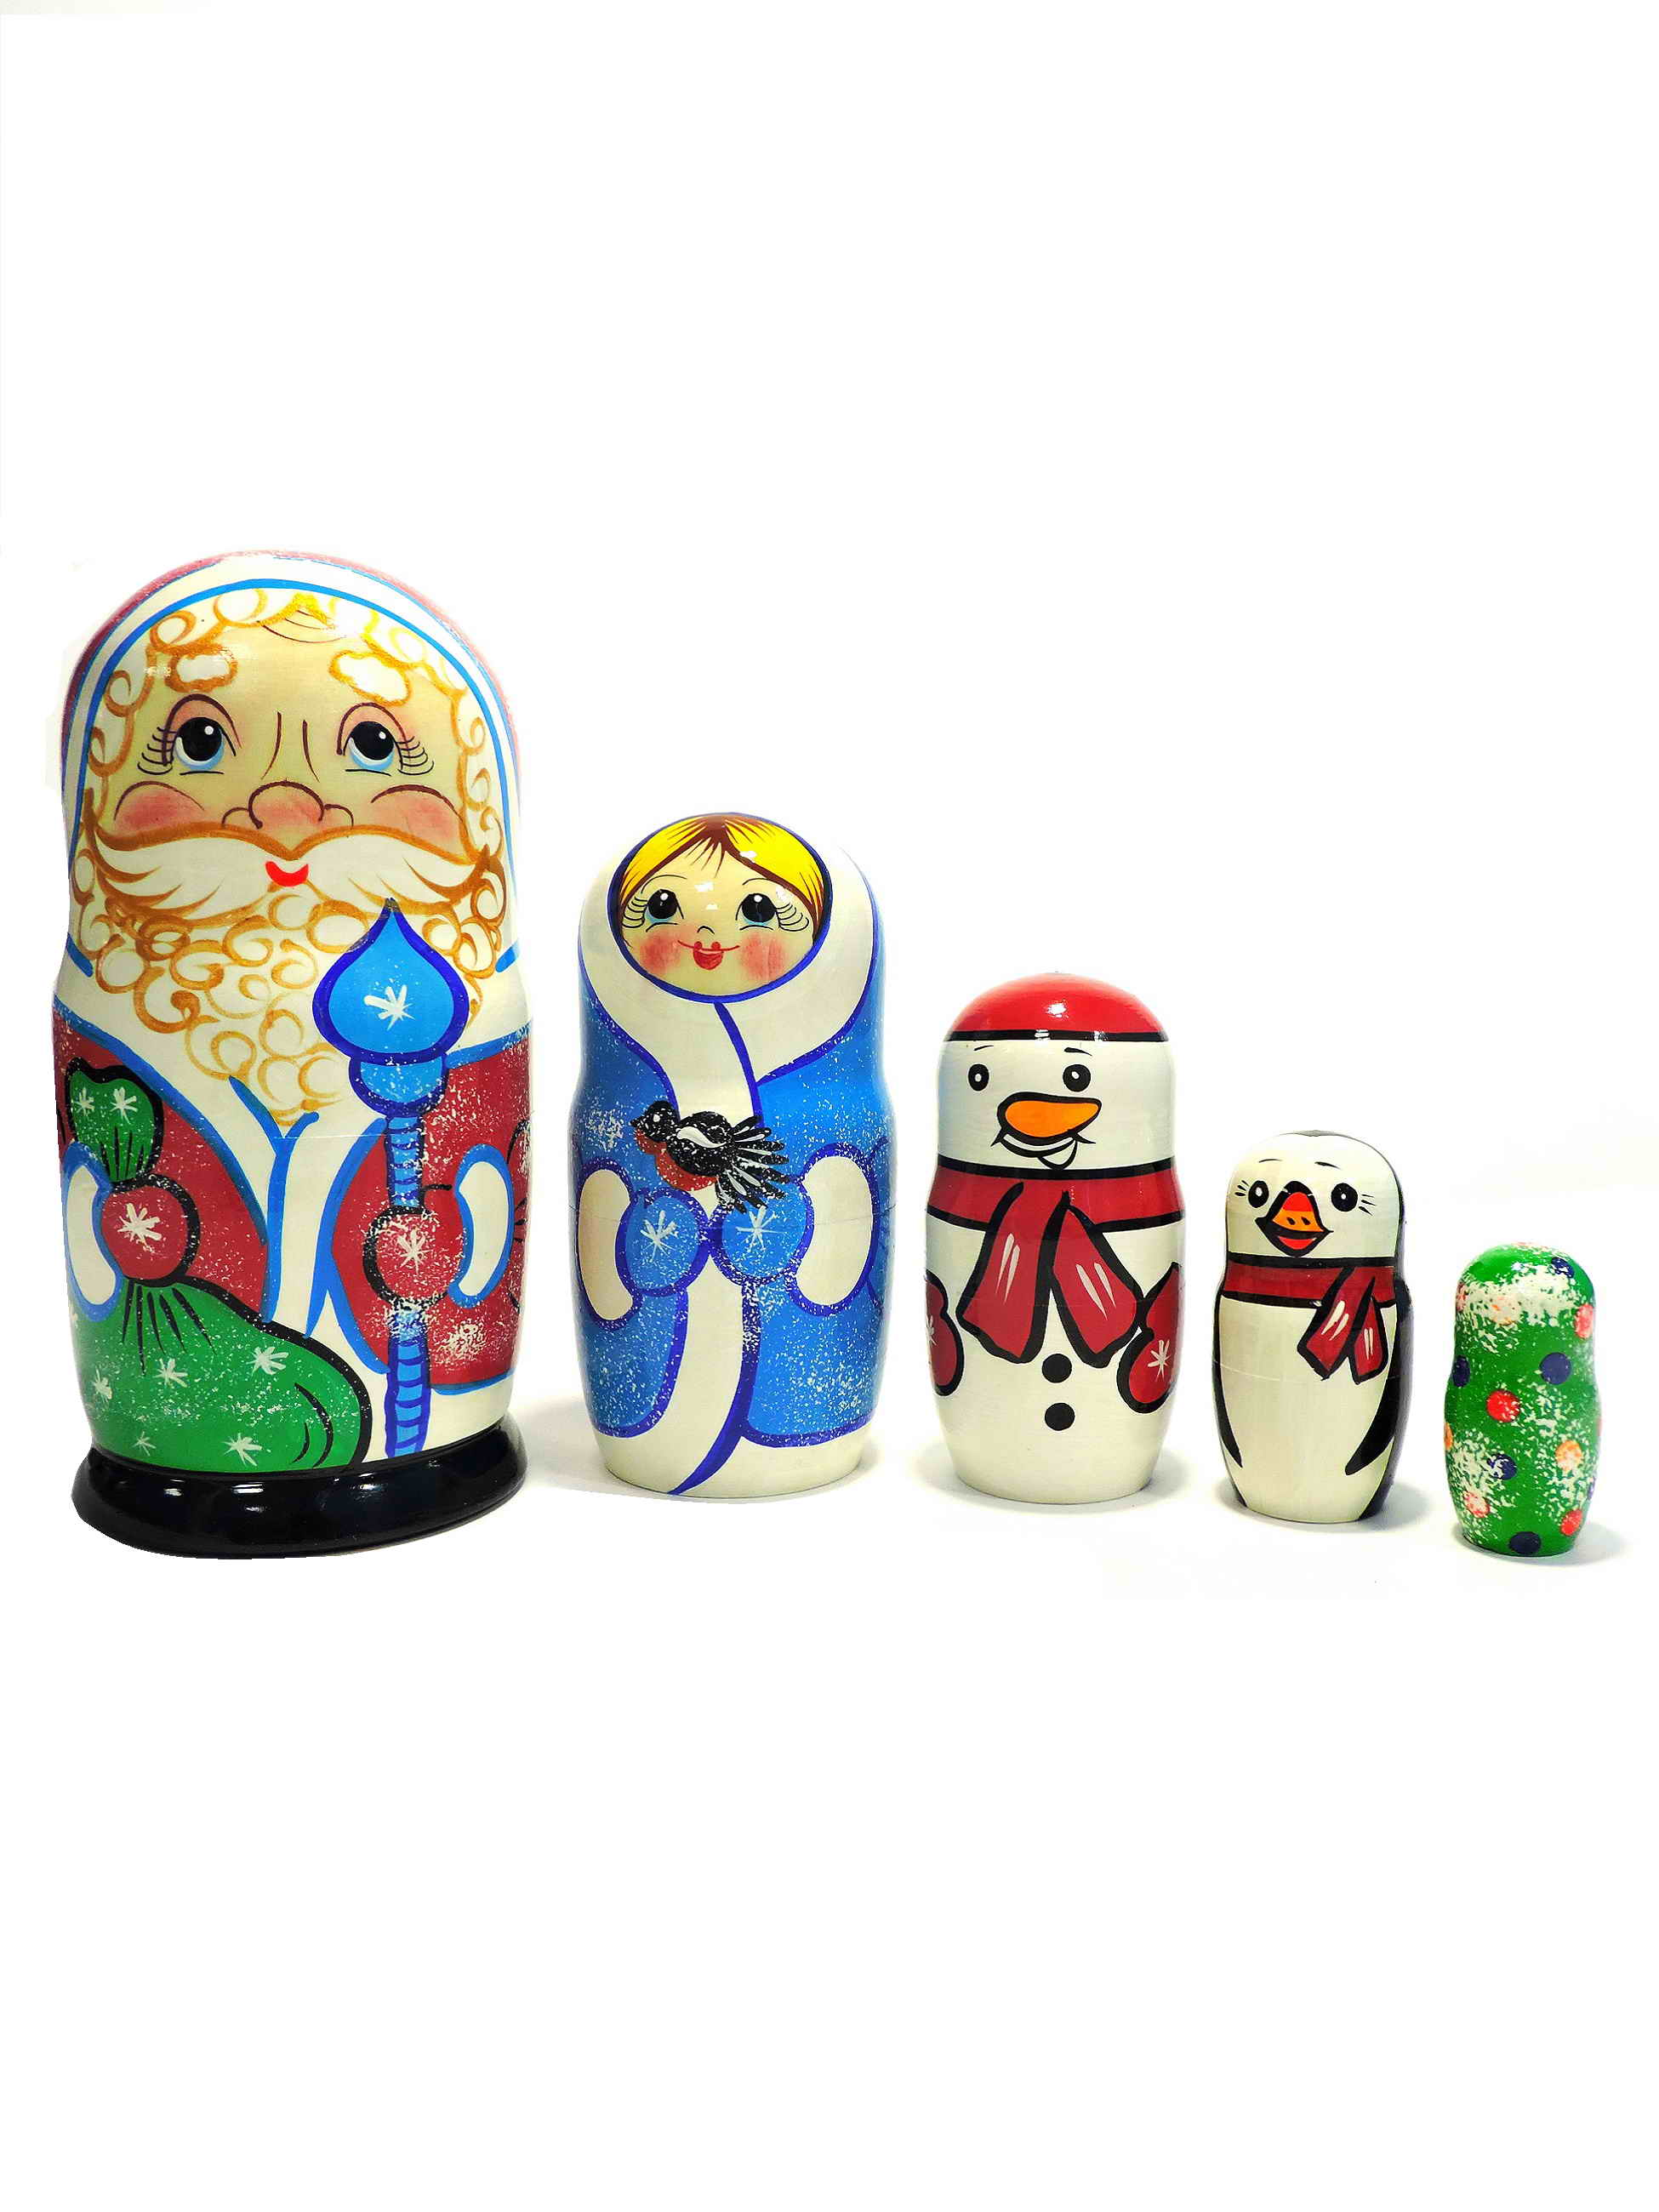 Матрешка. Дед Мороз (зеленый мешок)